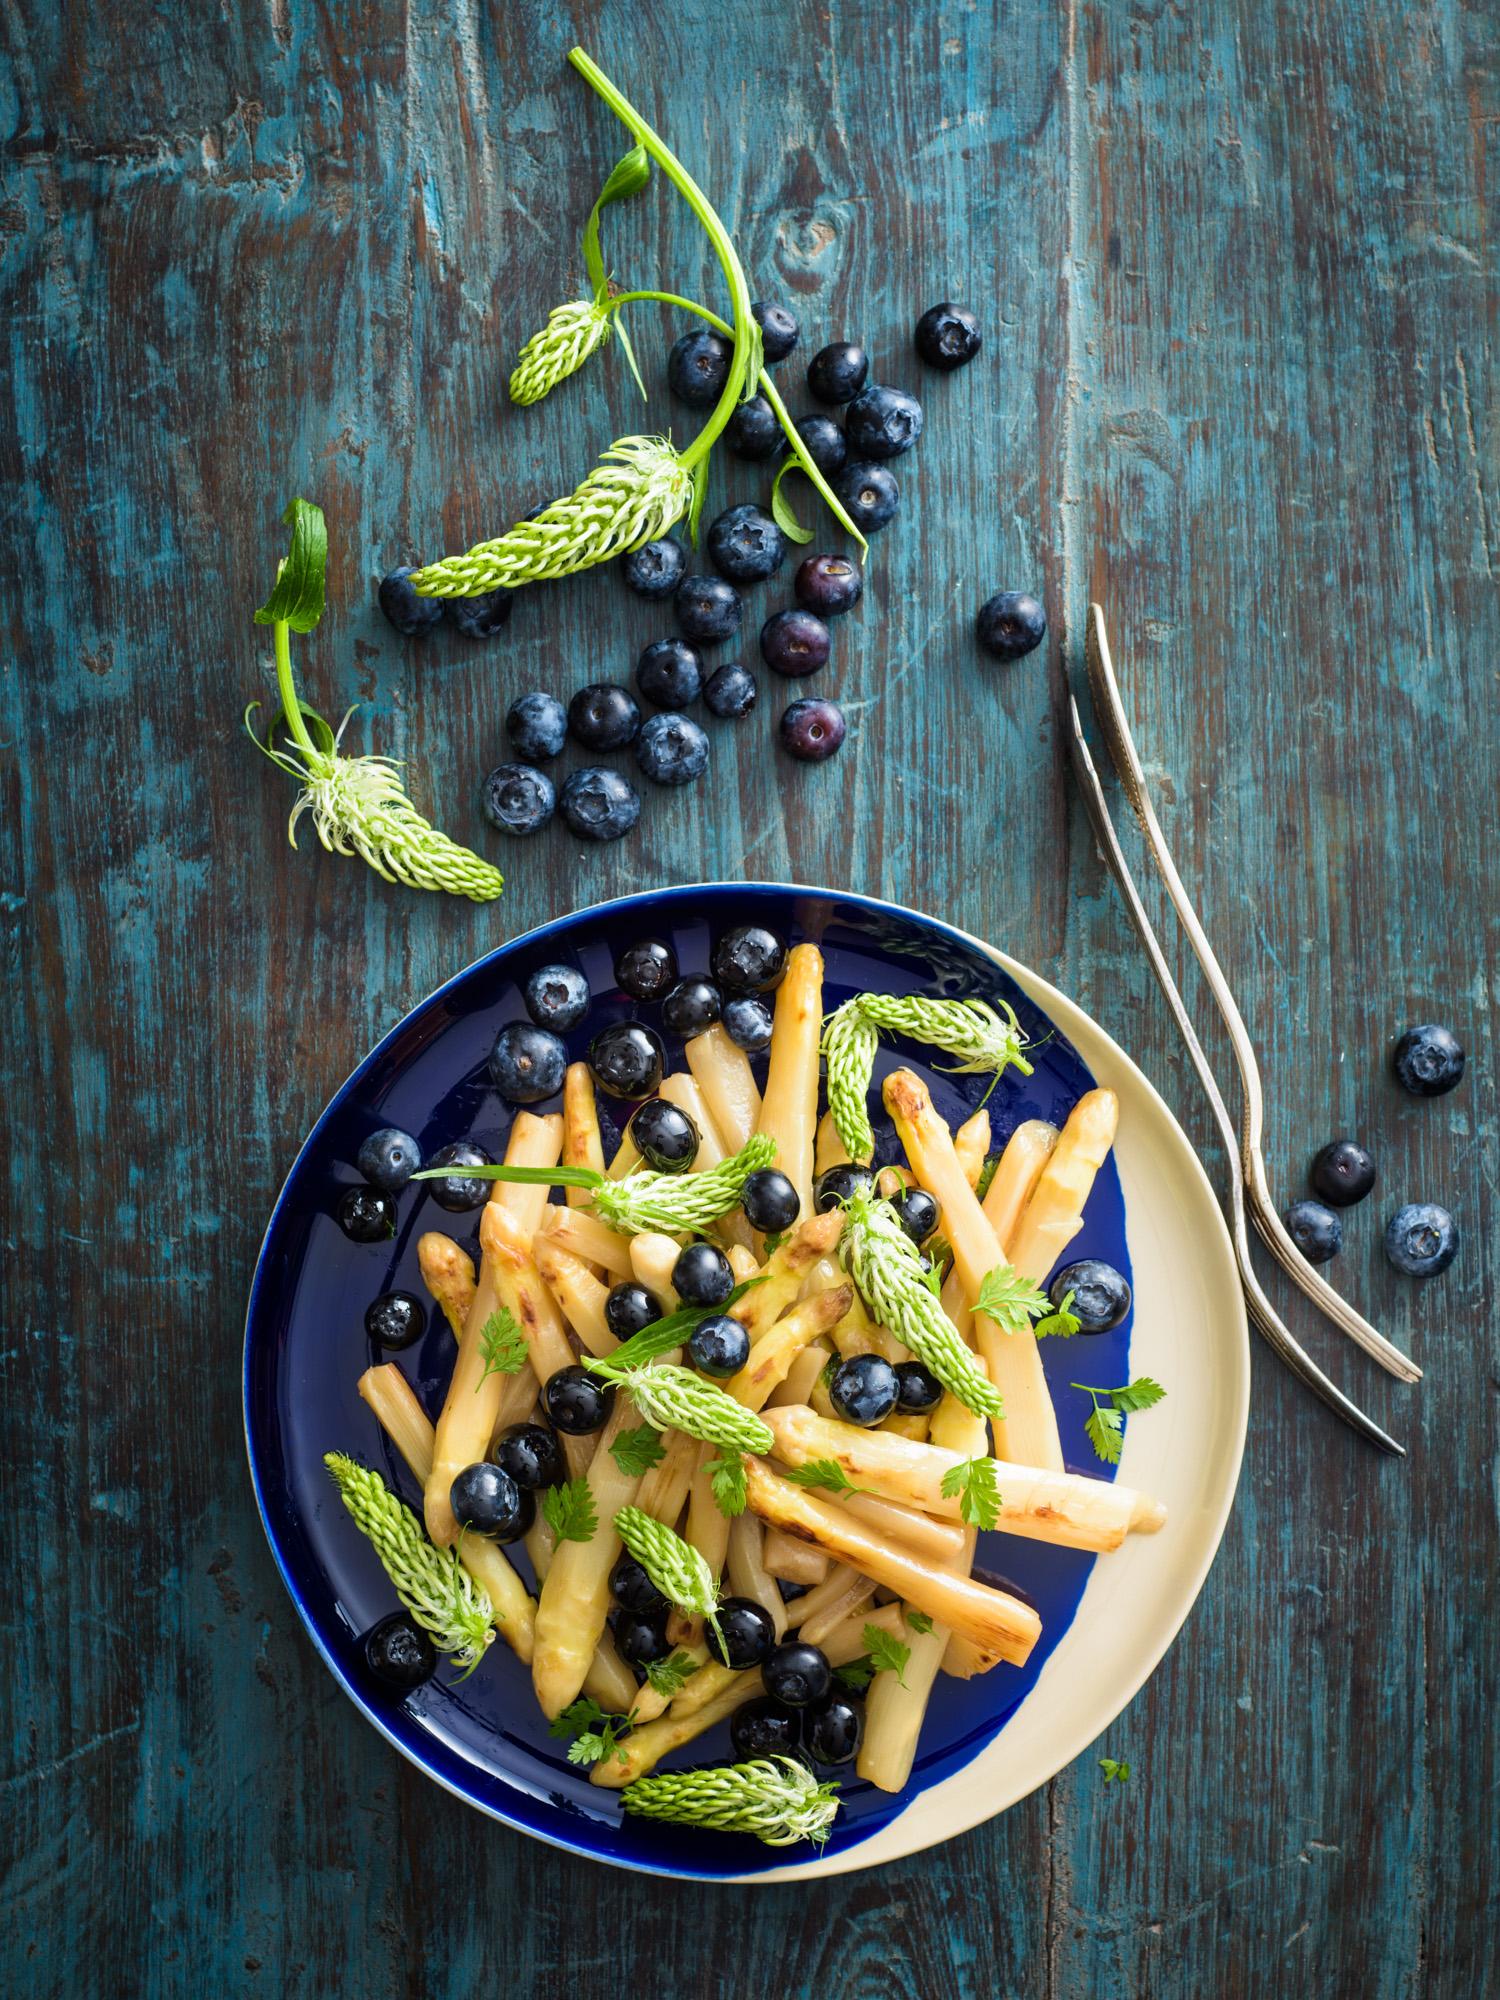 Teufelskralle_Spargel_Blueberry_Salat